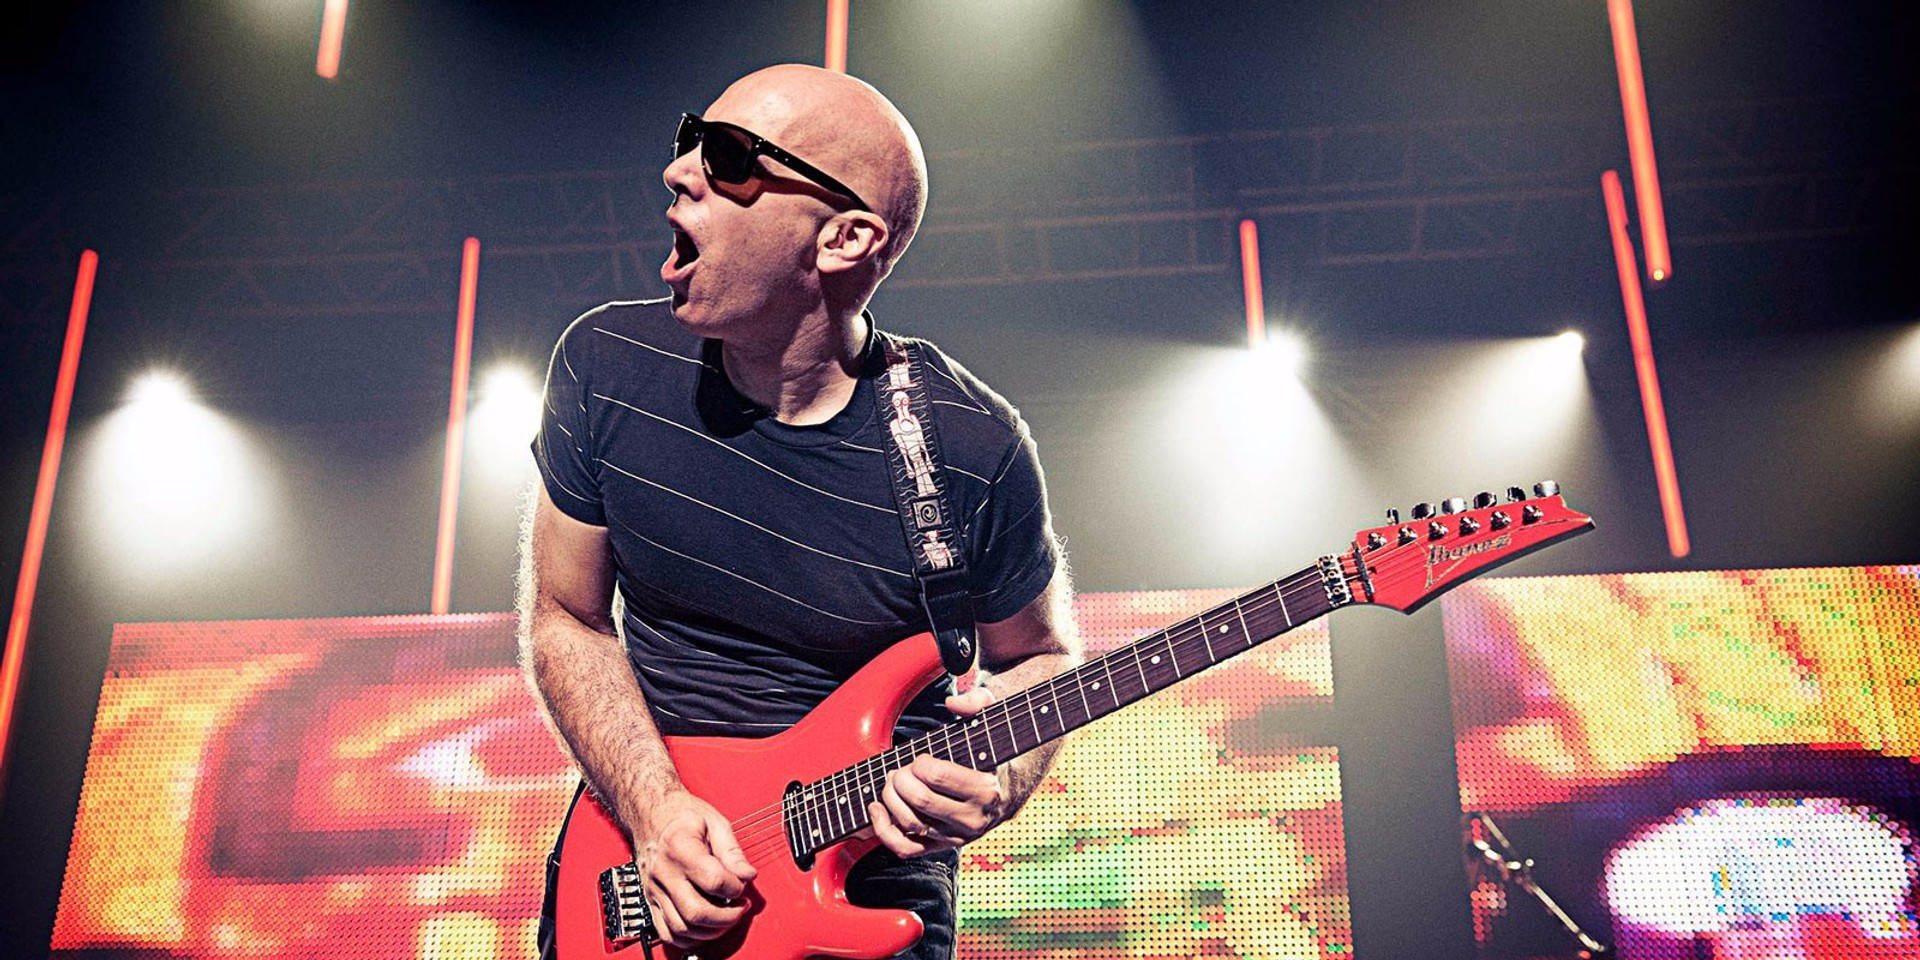 All-time great rock guitarist Joe Satriani returns to Singapore in 2017